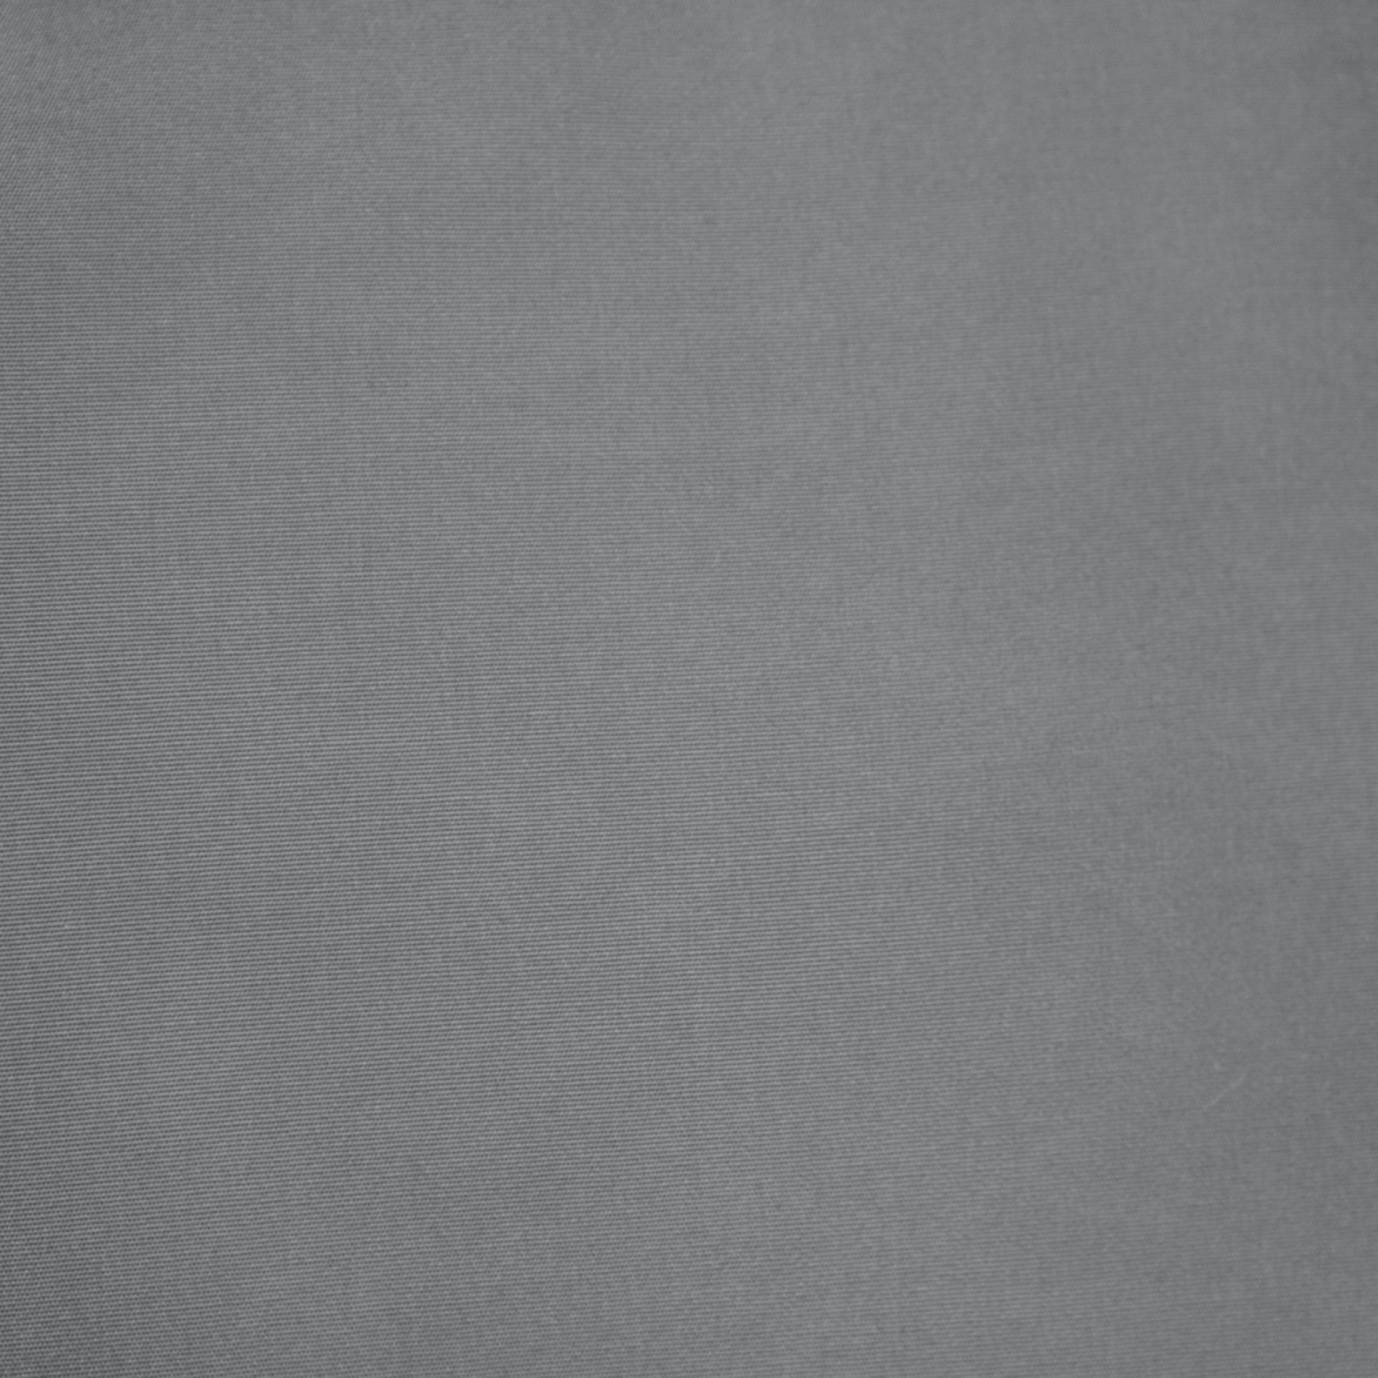 Deco™ Swivel Barstool 2pk - Charcoal Gray